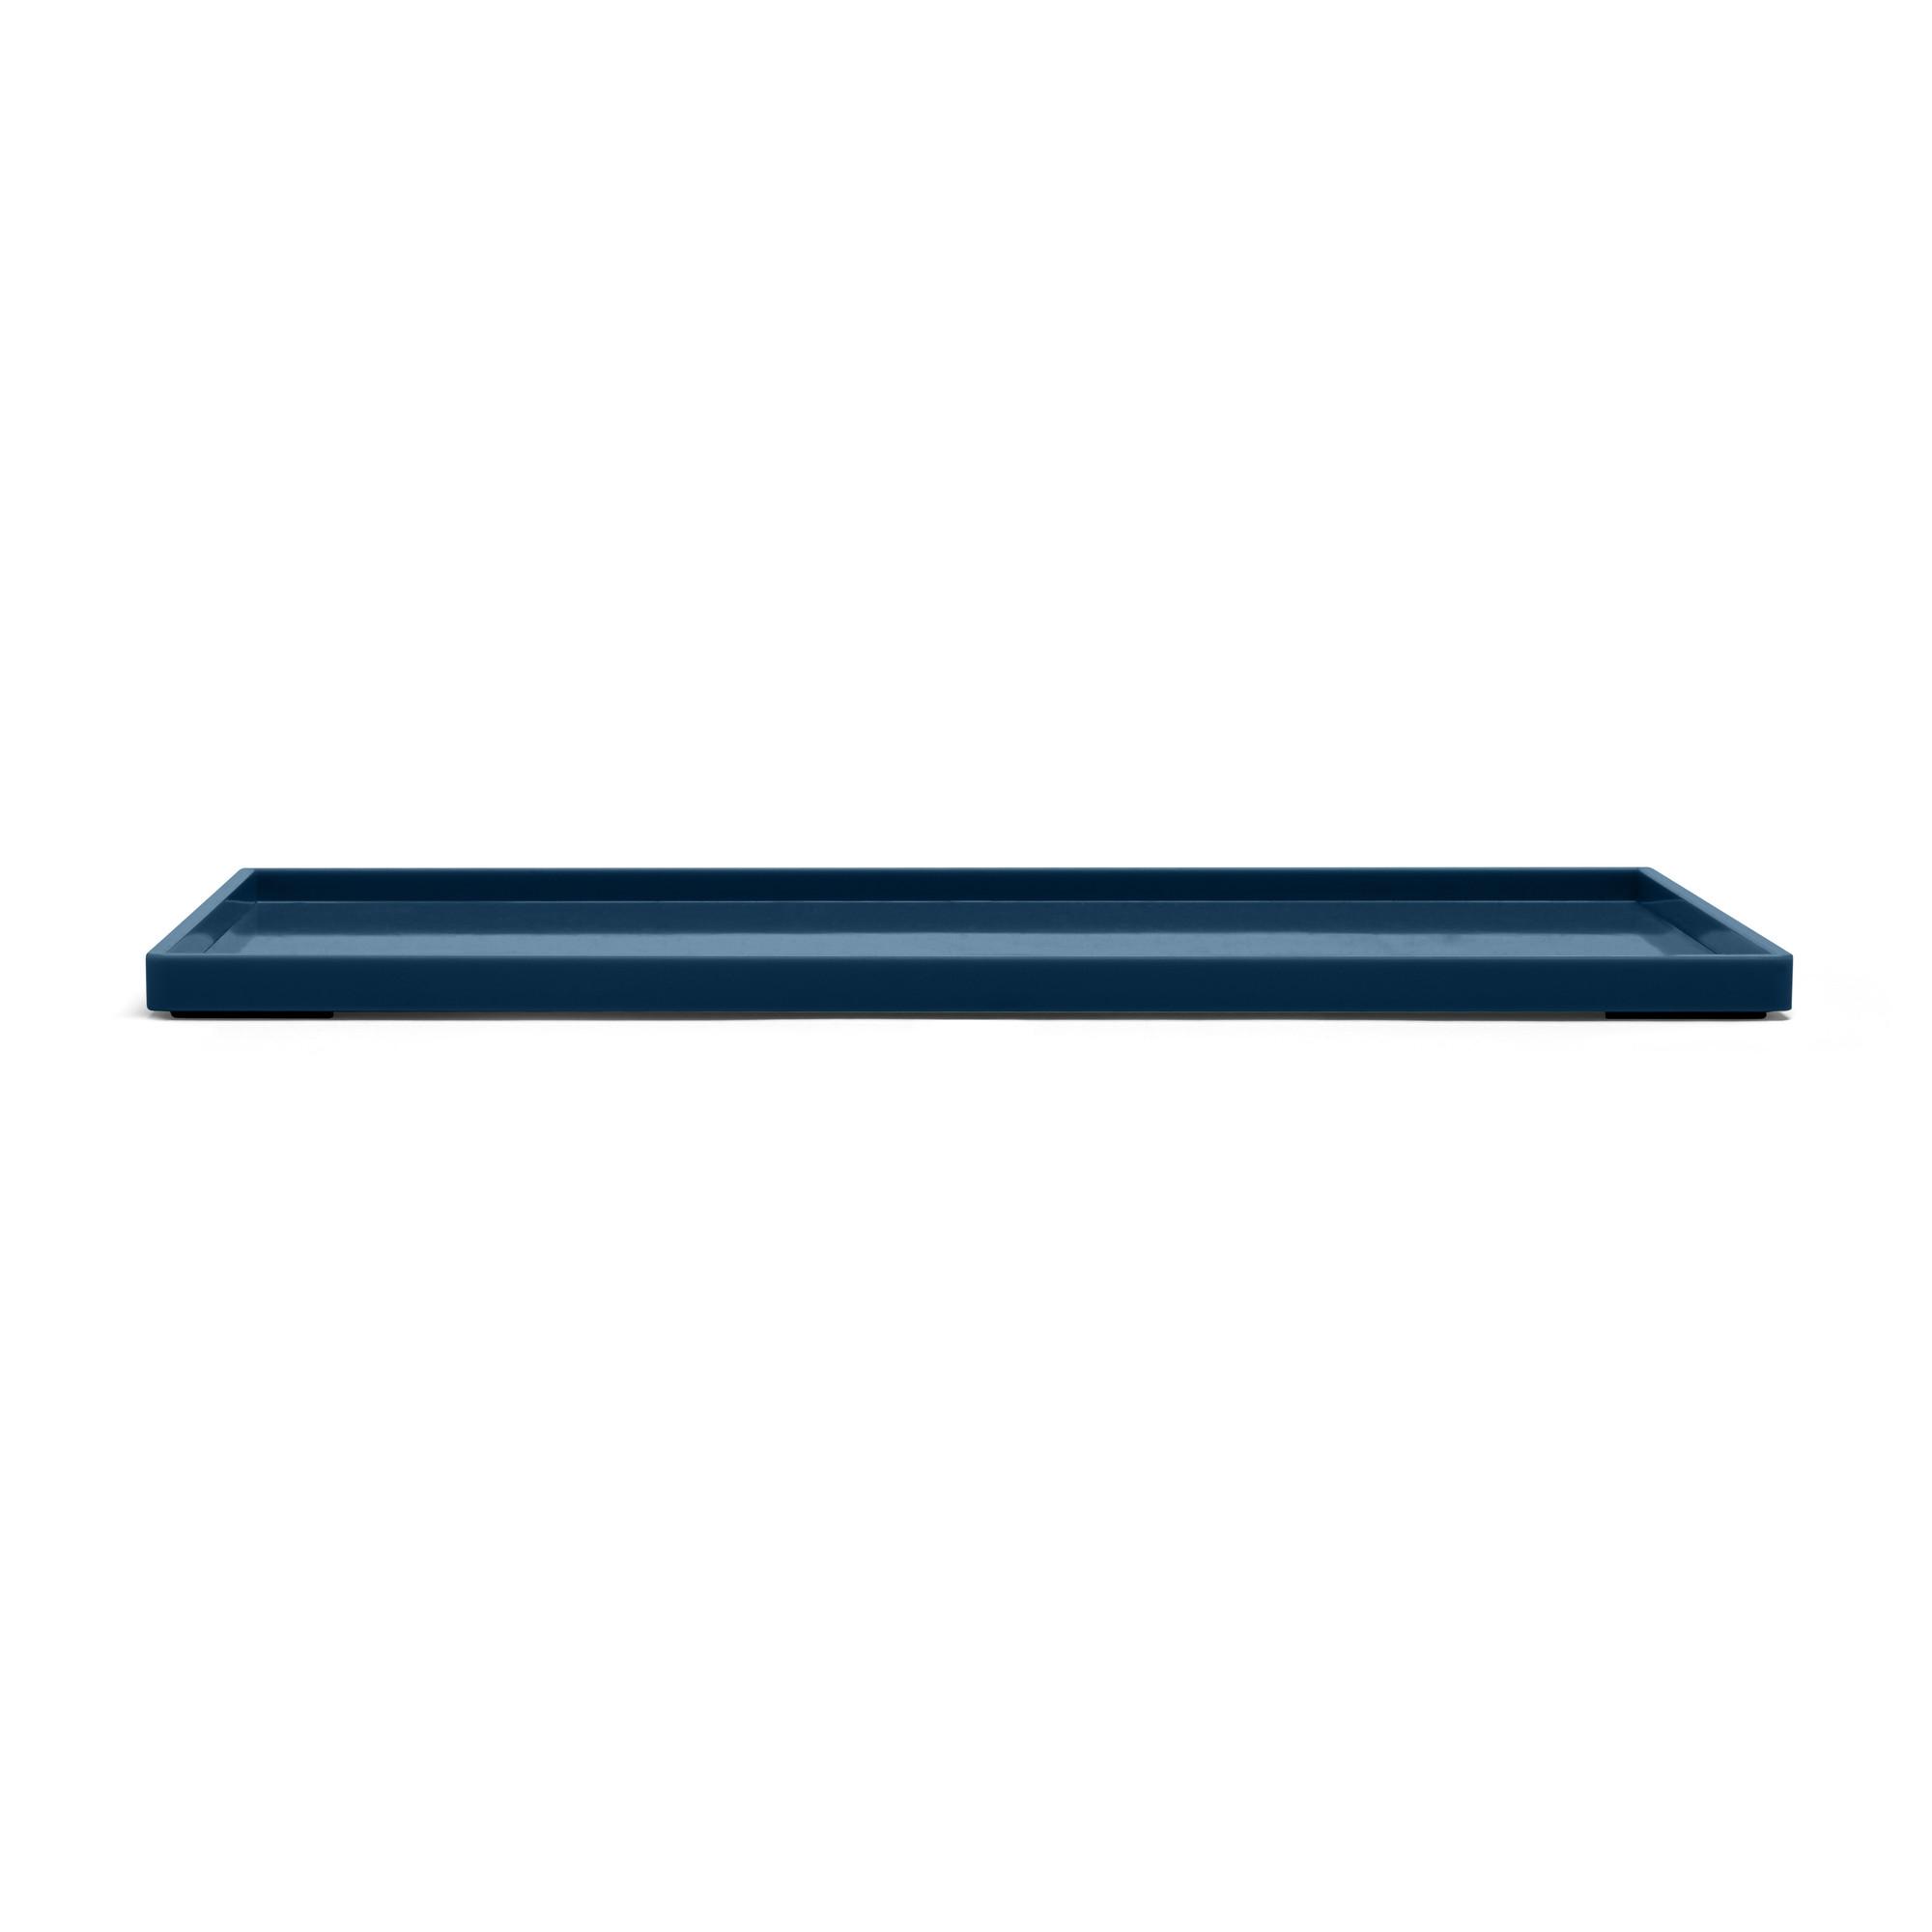 Slate Blue Large Slim Tray Desk Accessories Organization Poppin